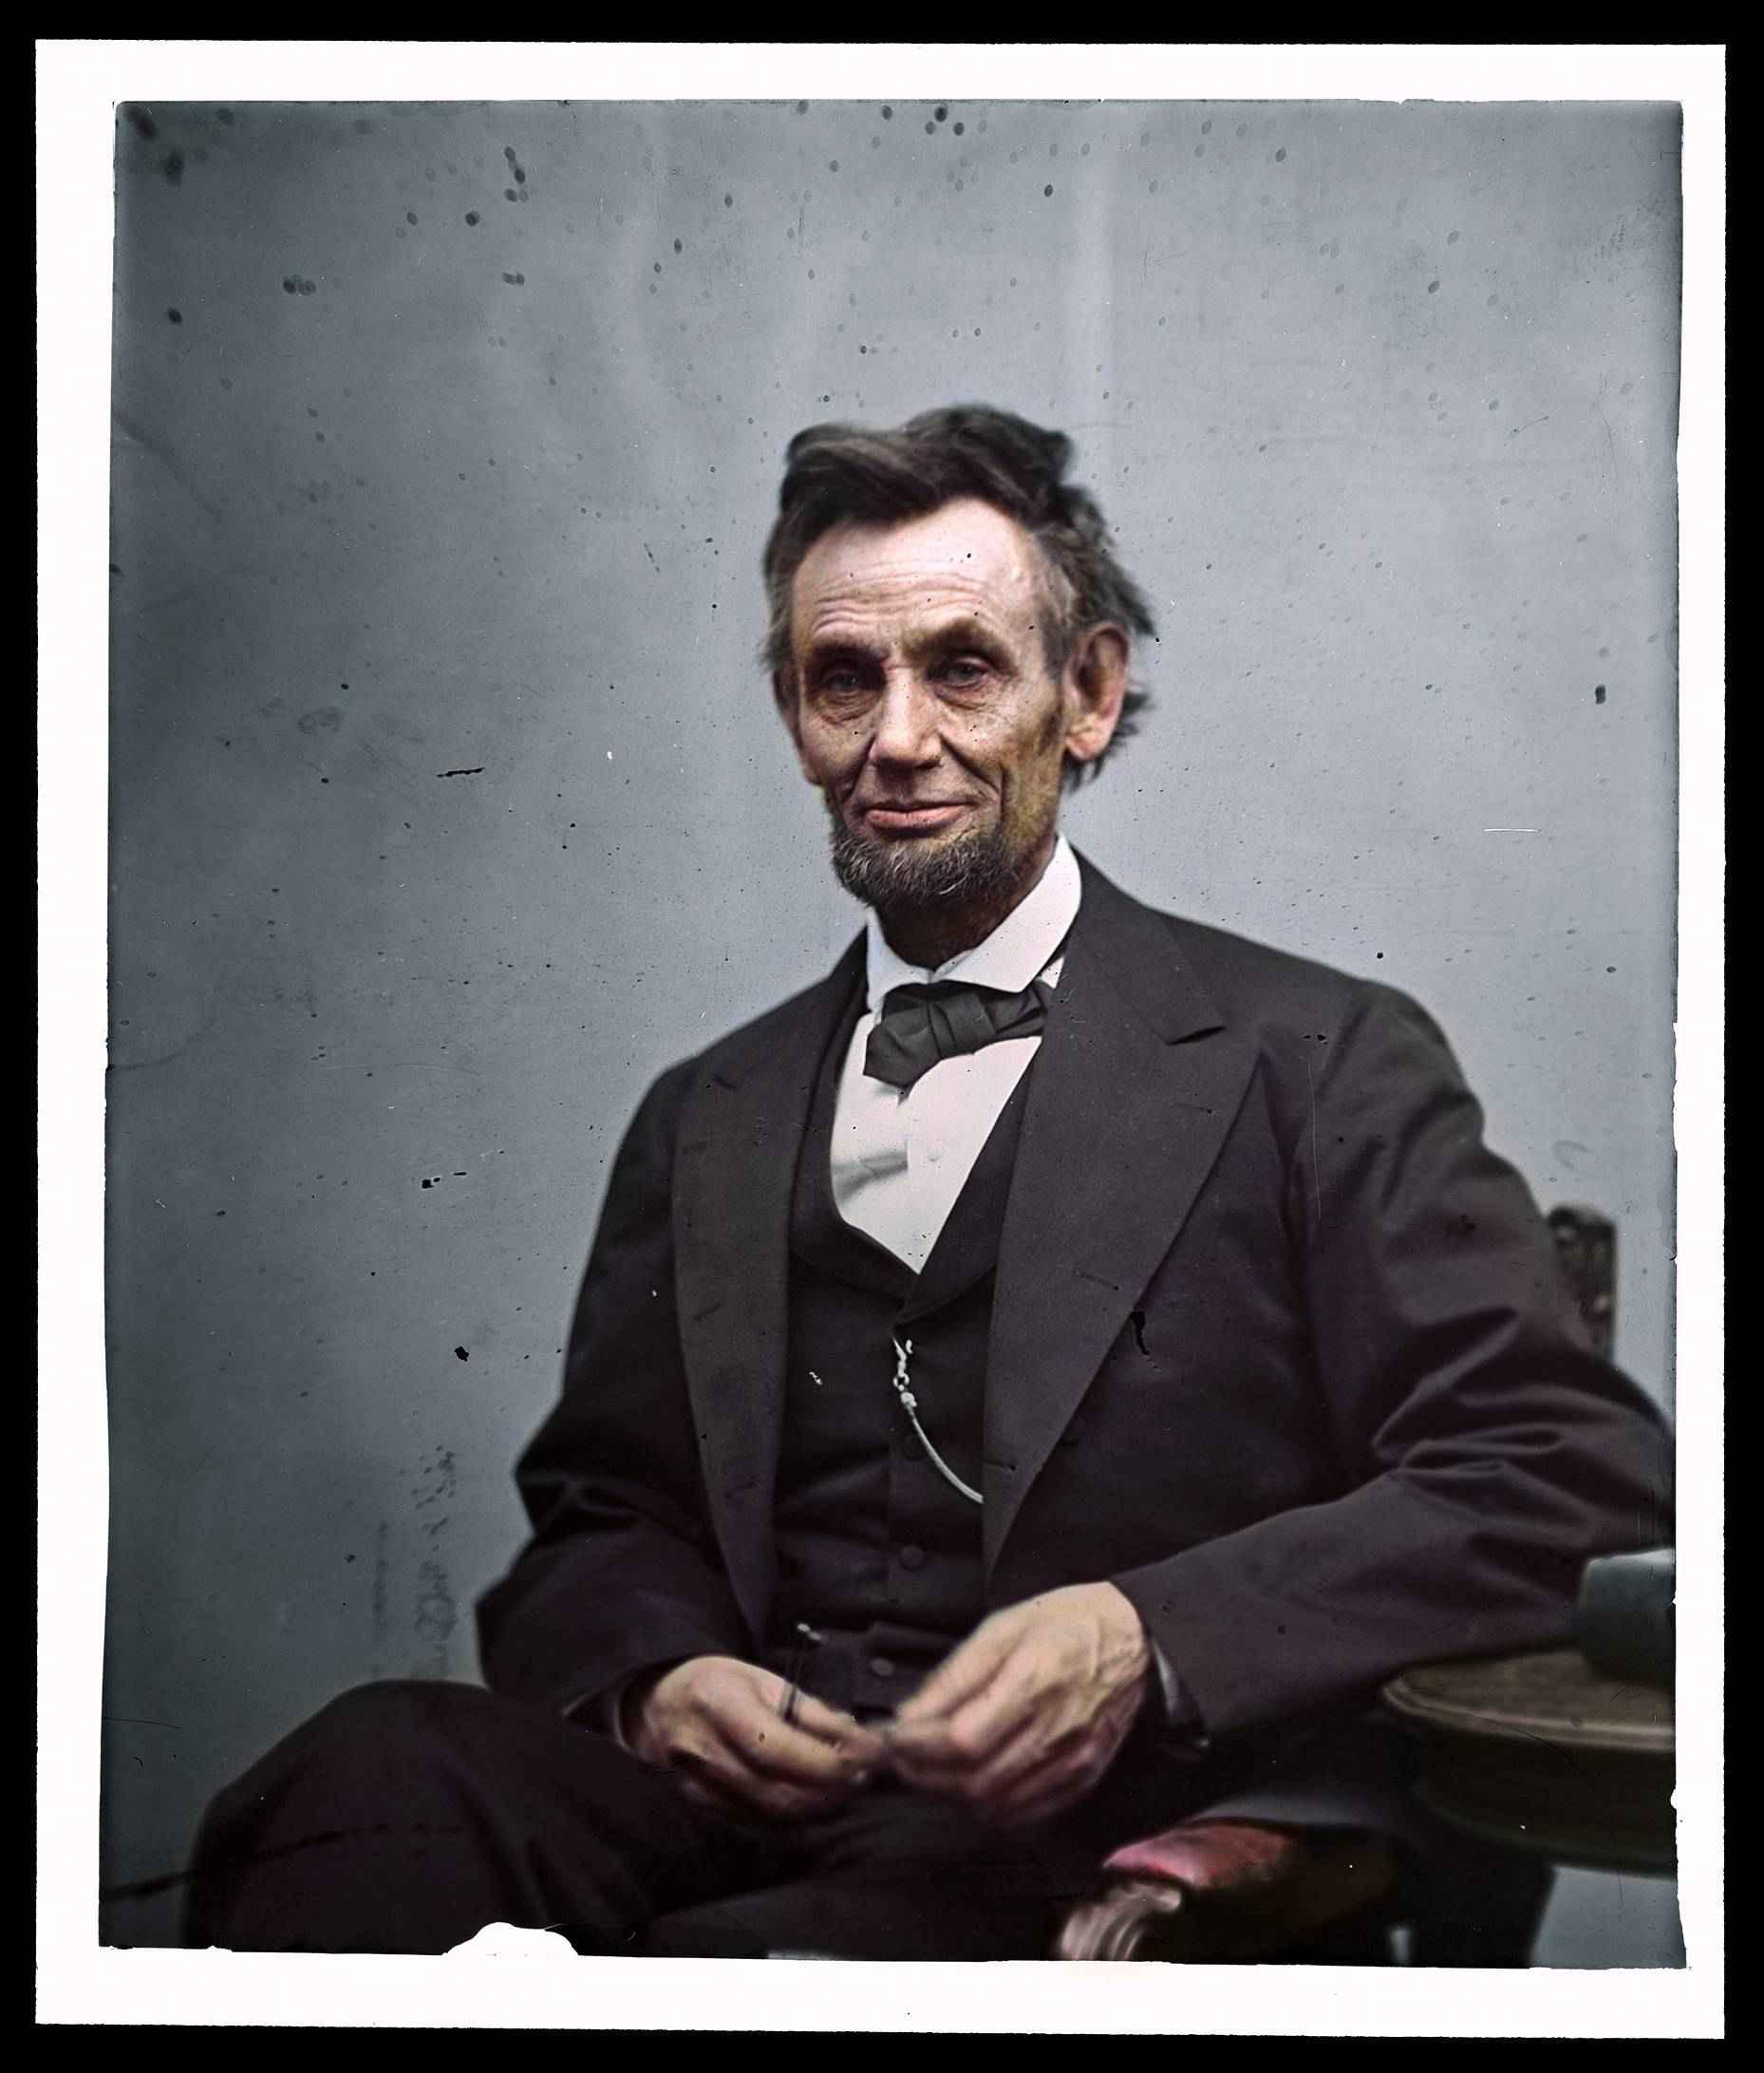 1865 - Abraham Lincoln